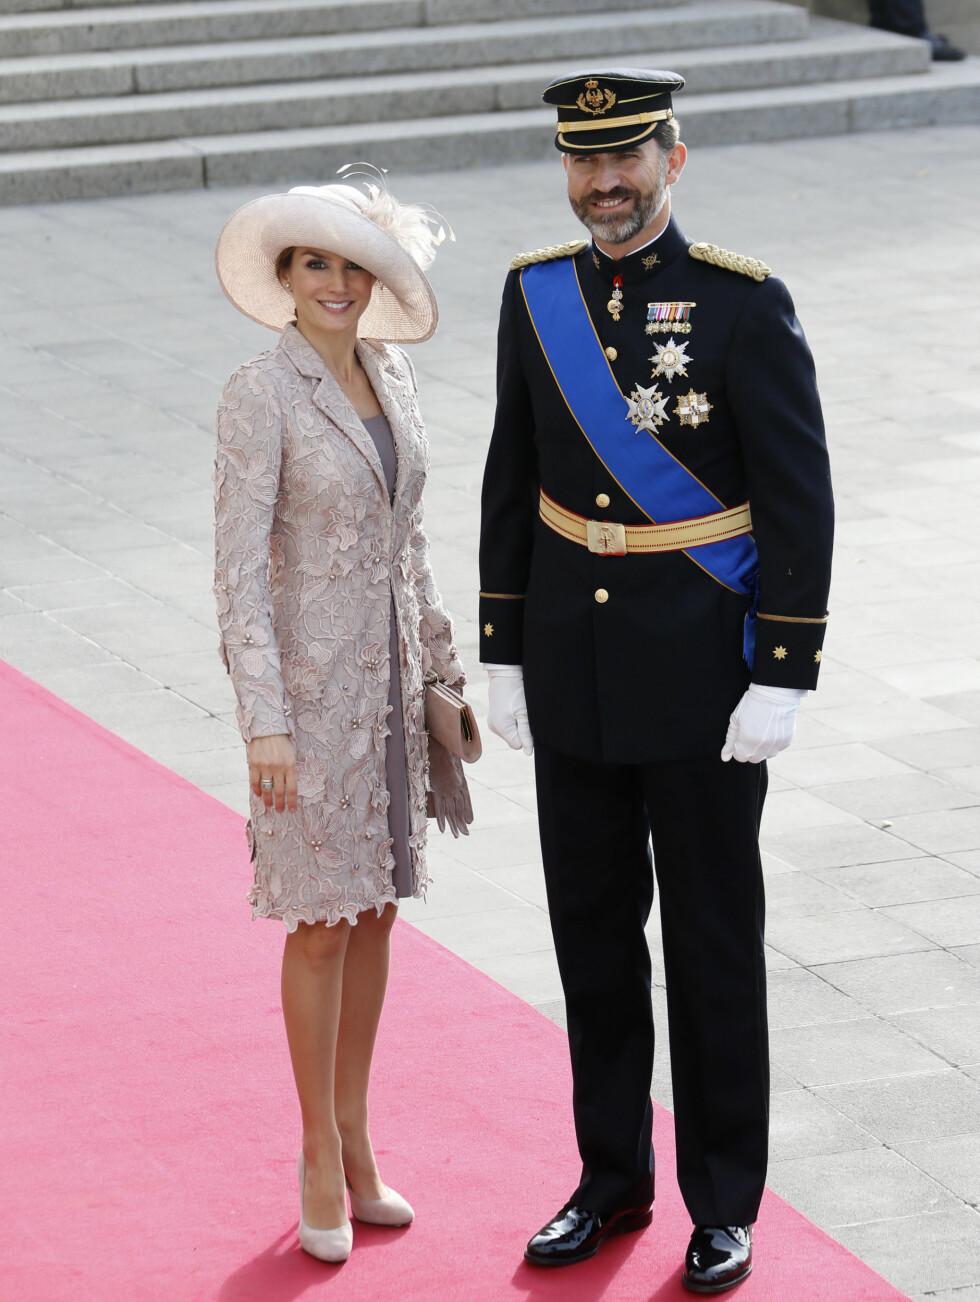 SMILTE TIL FOTOGRAFENE: Spanias kronprins Felipe (R) og hans kone, prinsesse Letizia var i strålende humør da de ankom Notre Dame. Foto: Scanpix/Reuters